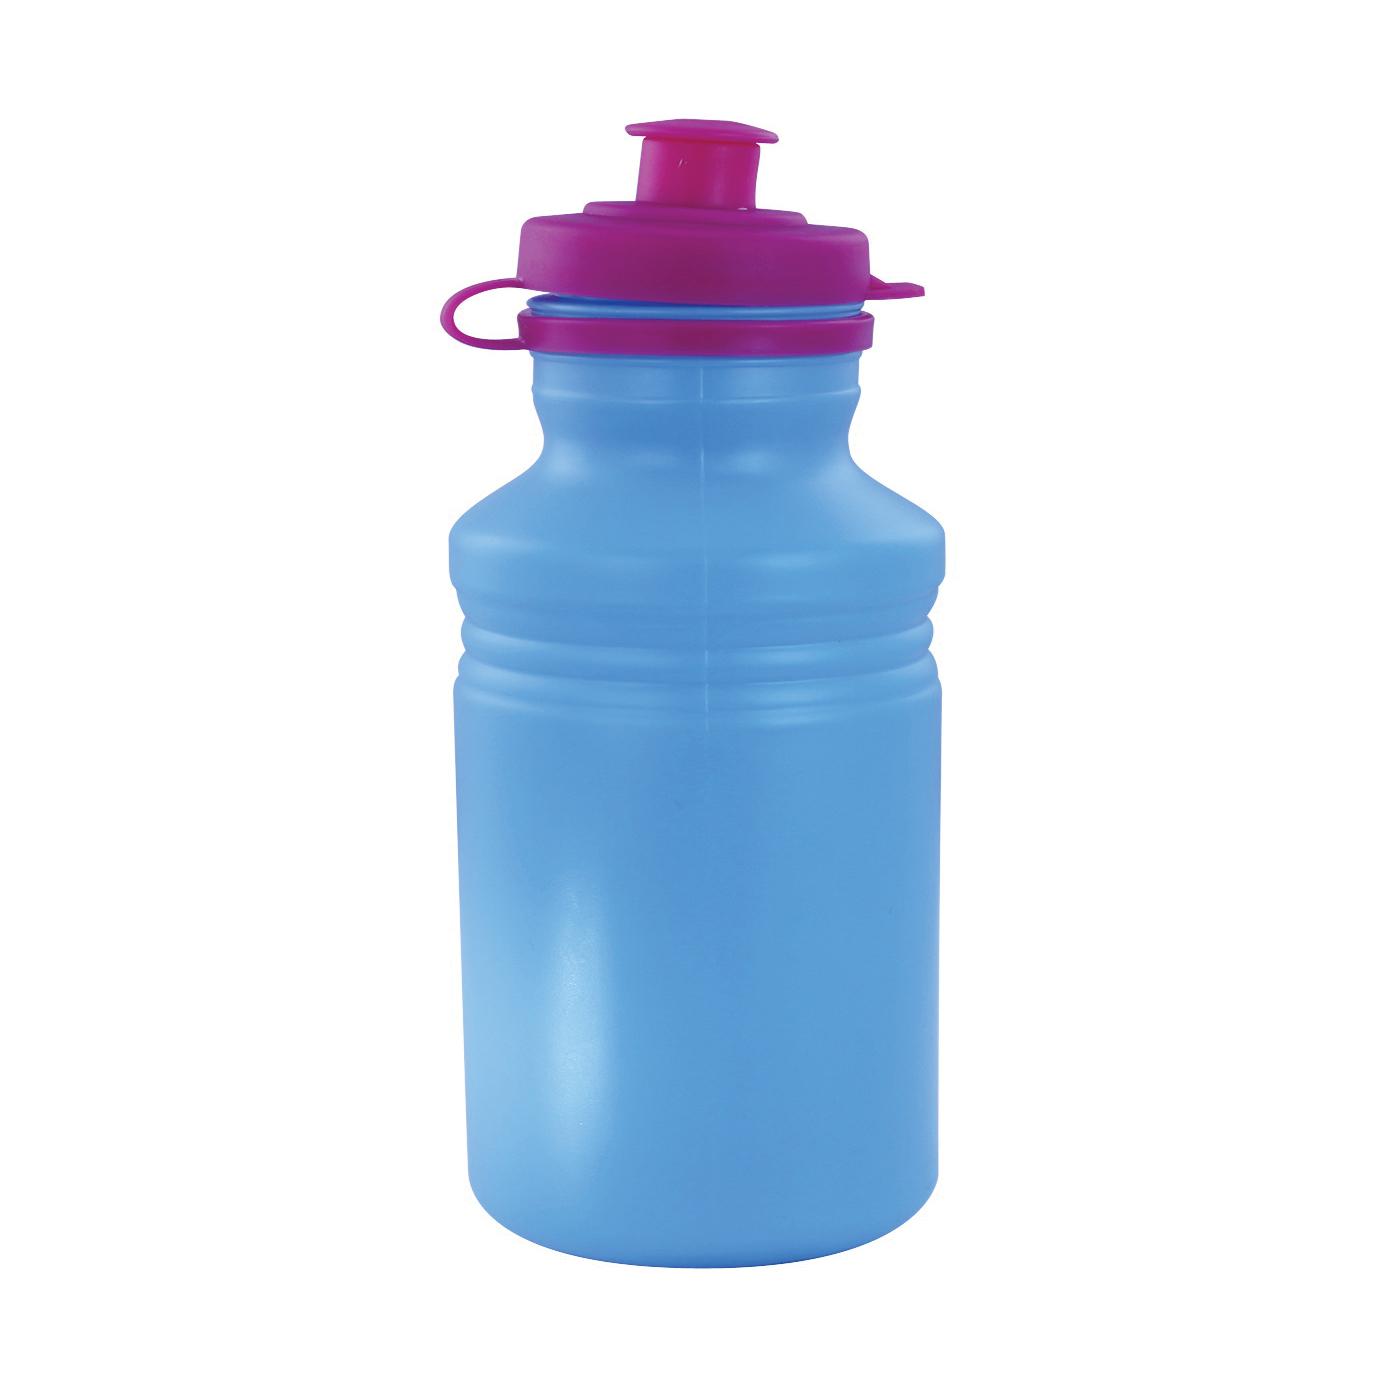 Picture of FLP 0995 Water Bottle, 16 oz Capacity